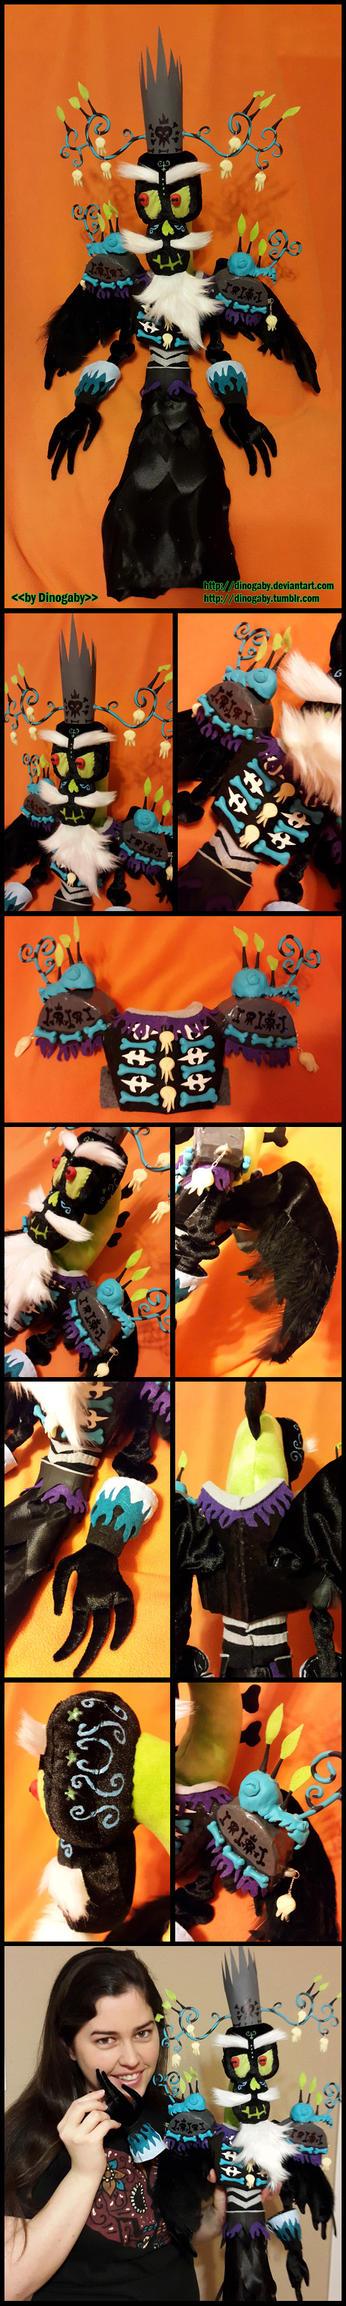 Xibalba plushie by Dinogaby